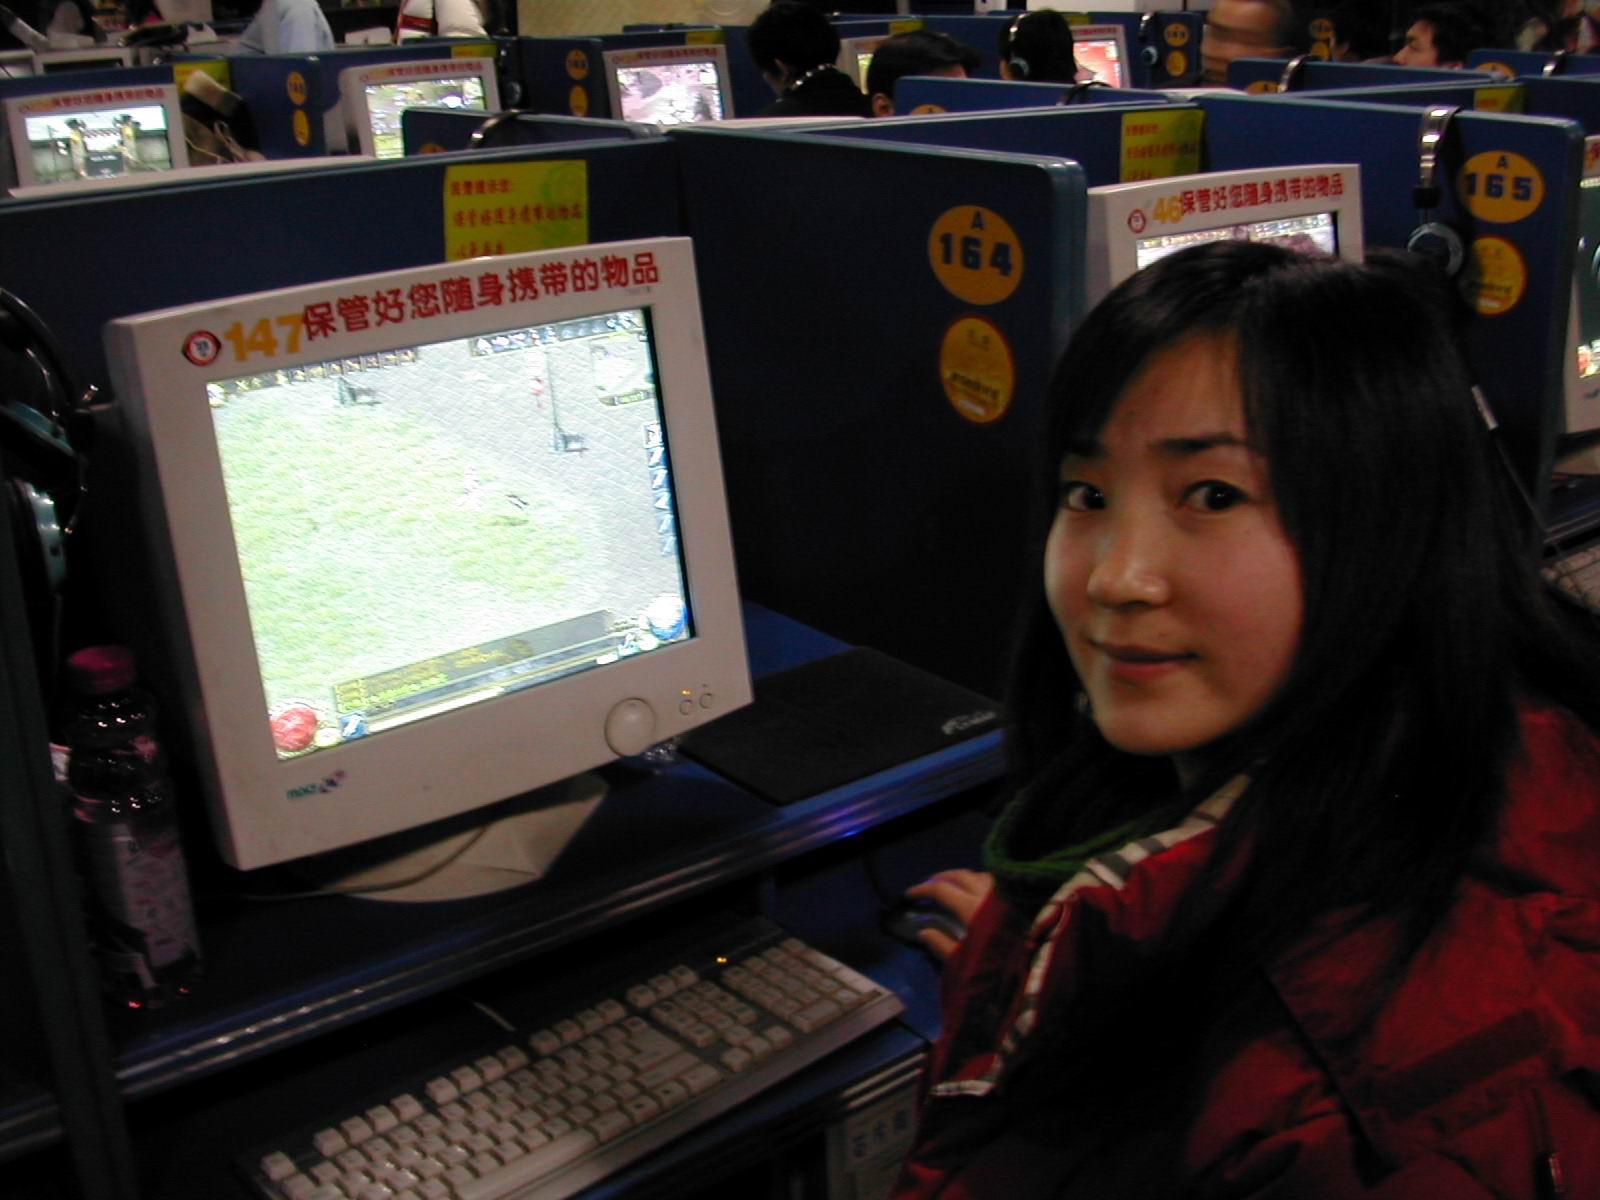 sohu.com/goto.php3?code=bo-news-1227